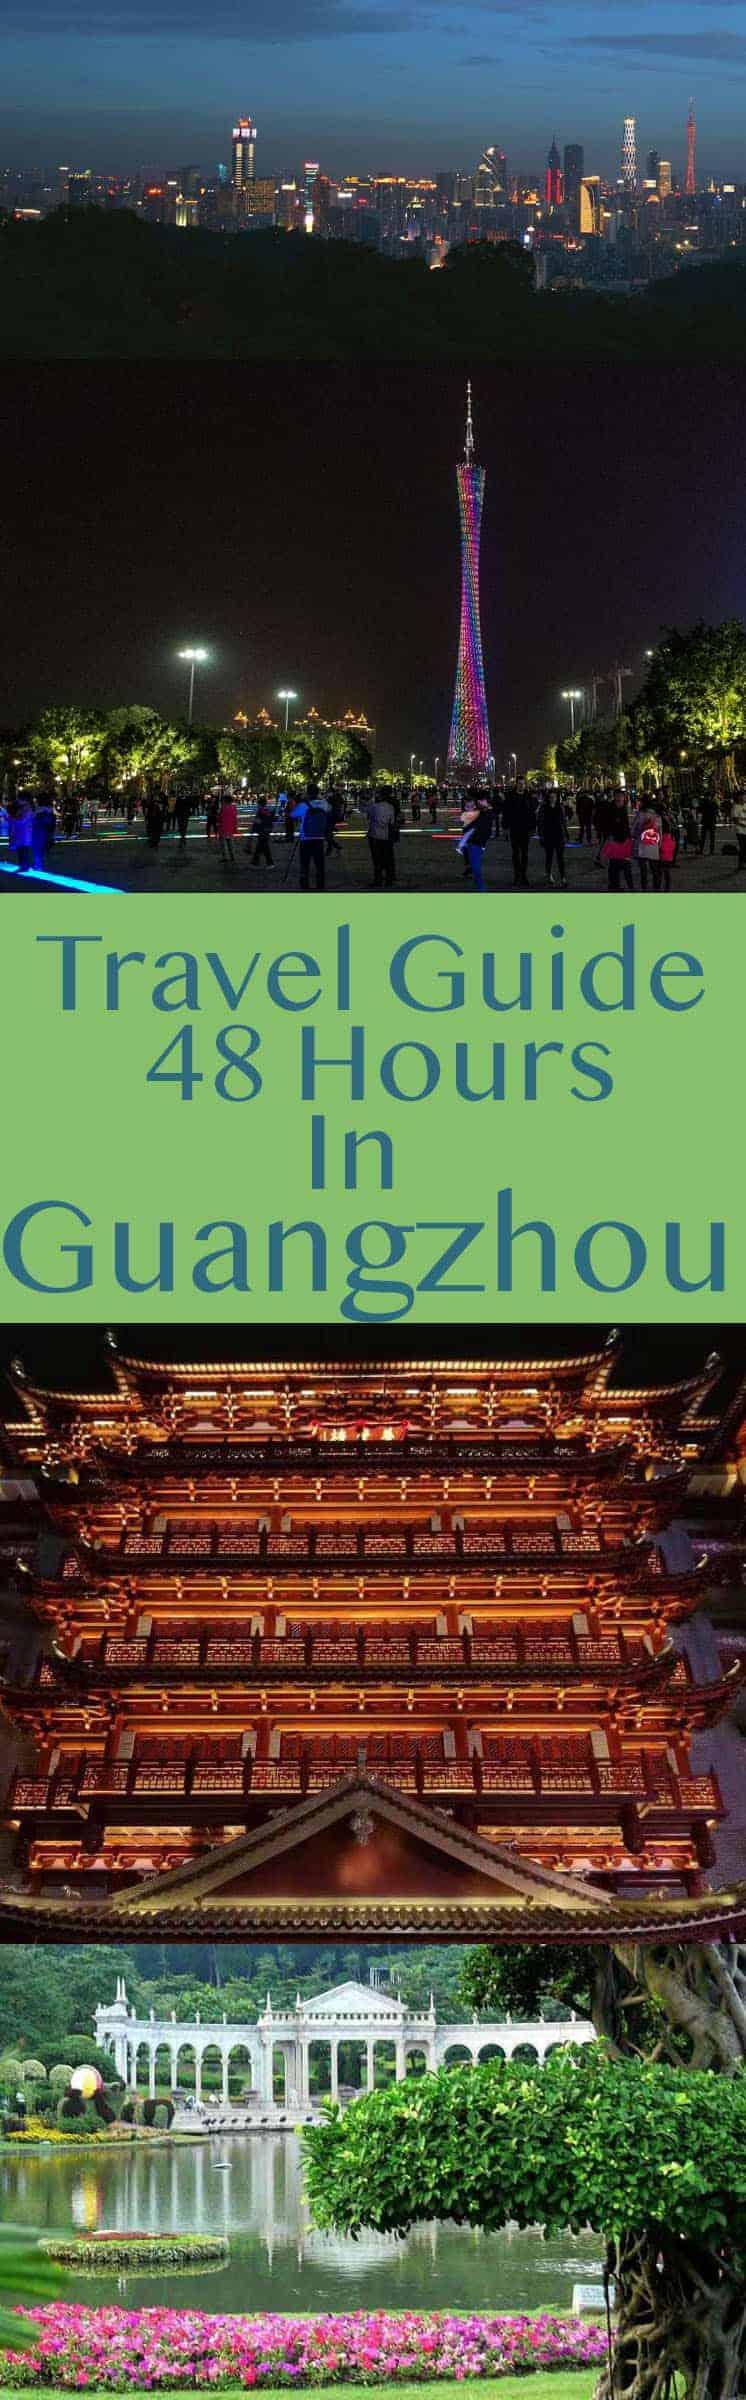 Travel Guide to Guangzhou China´s third biggest city